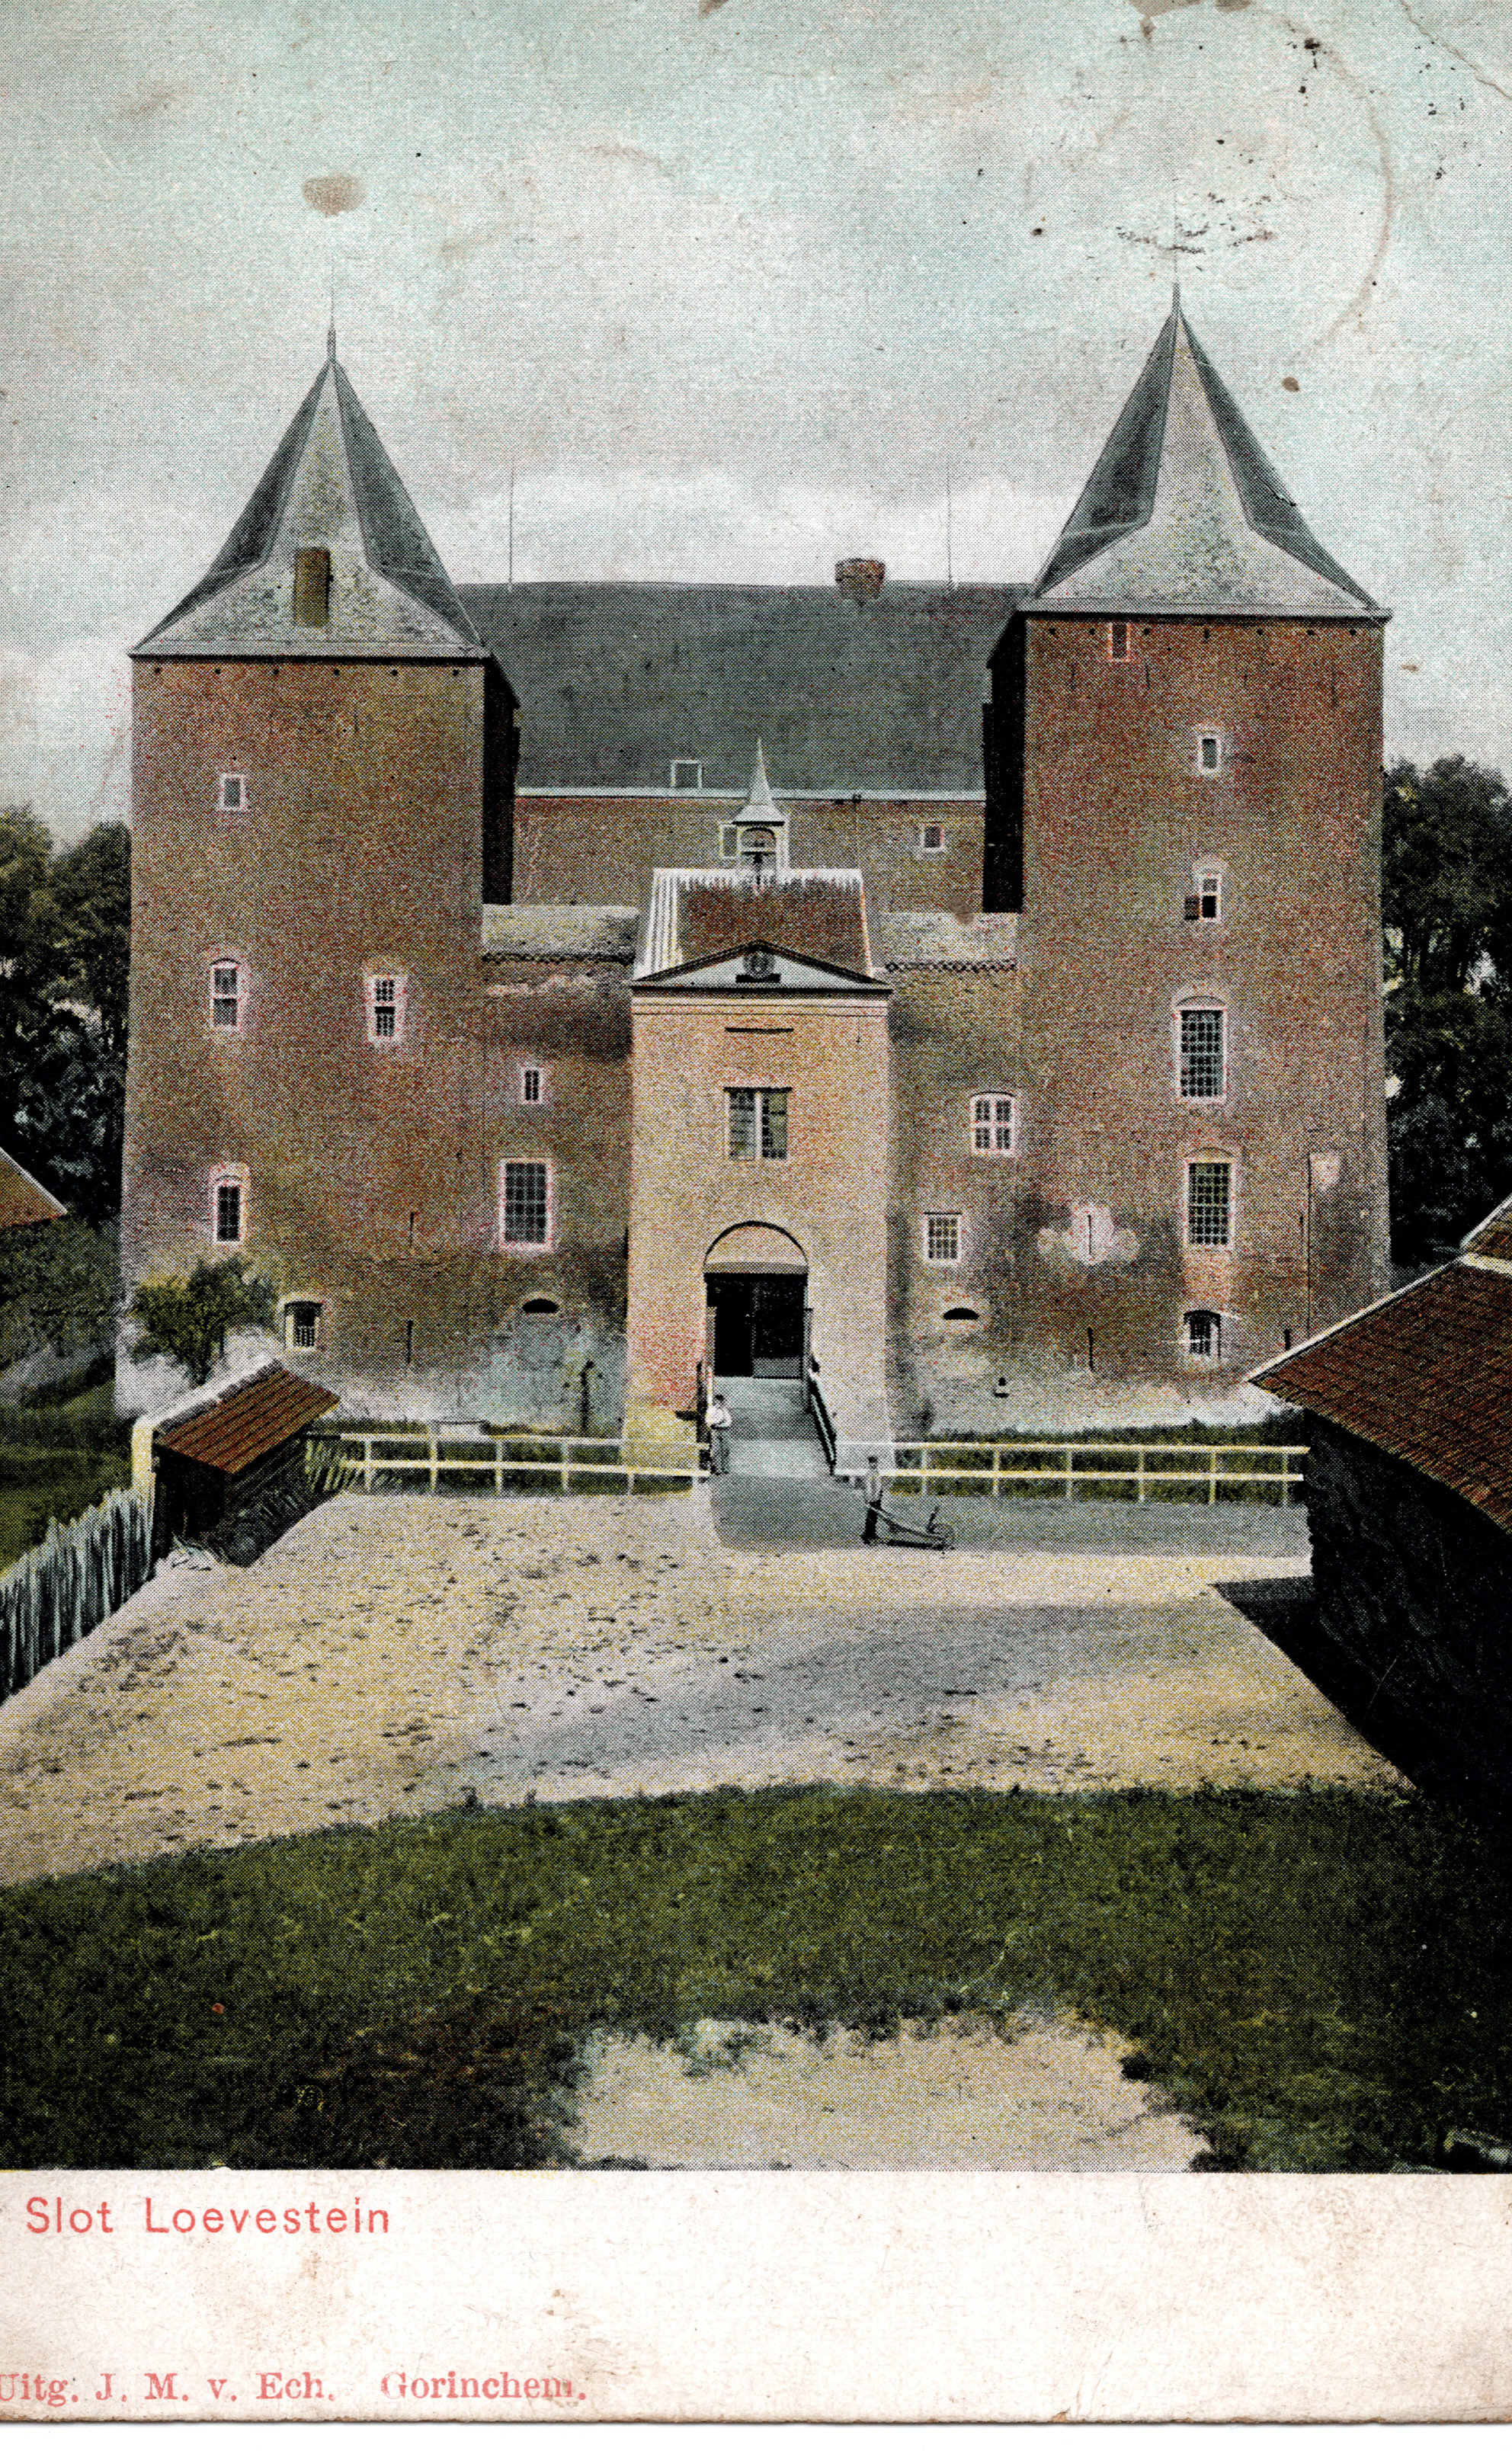 A11-Slot-Loevestein-1904